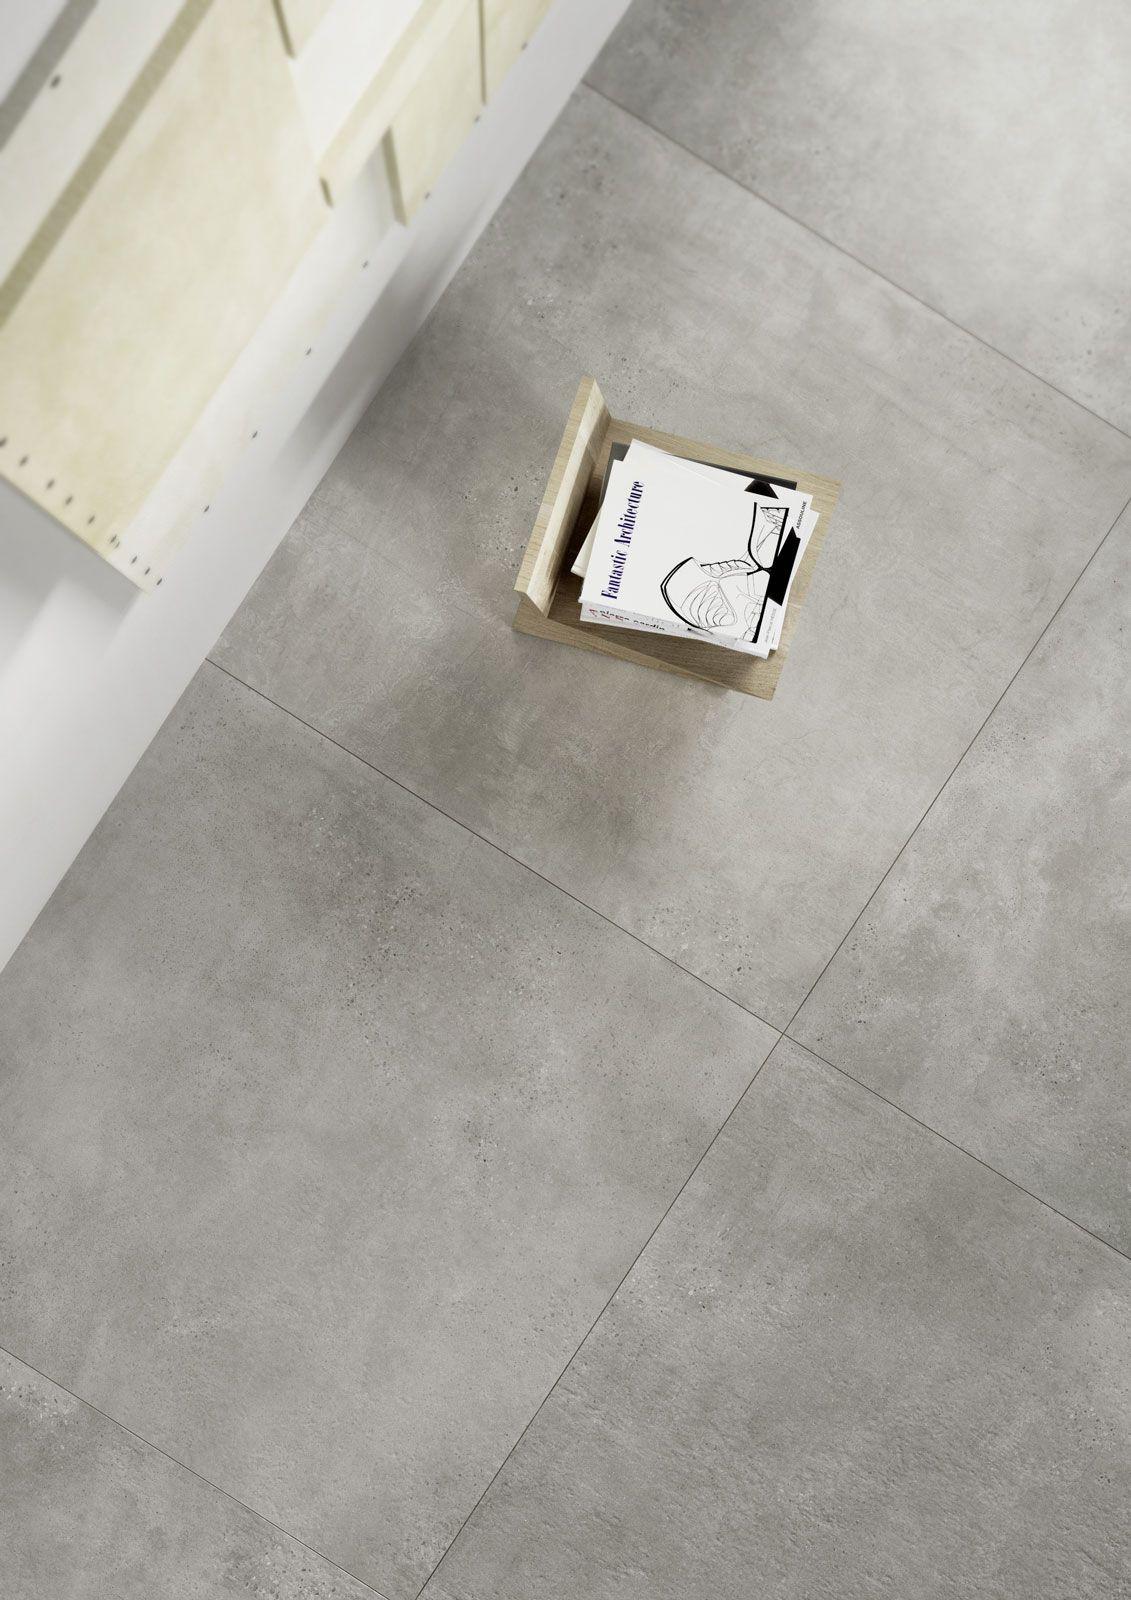 Xlstreet azulejos de cer mica marazzi 7191 lavabo - Suelo de ceramica ...